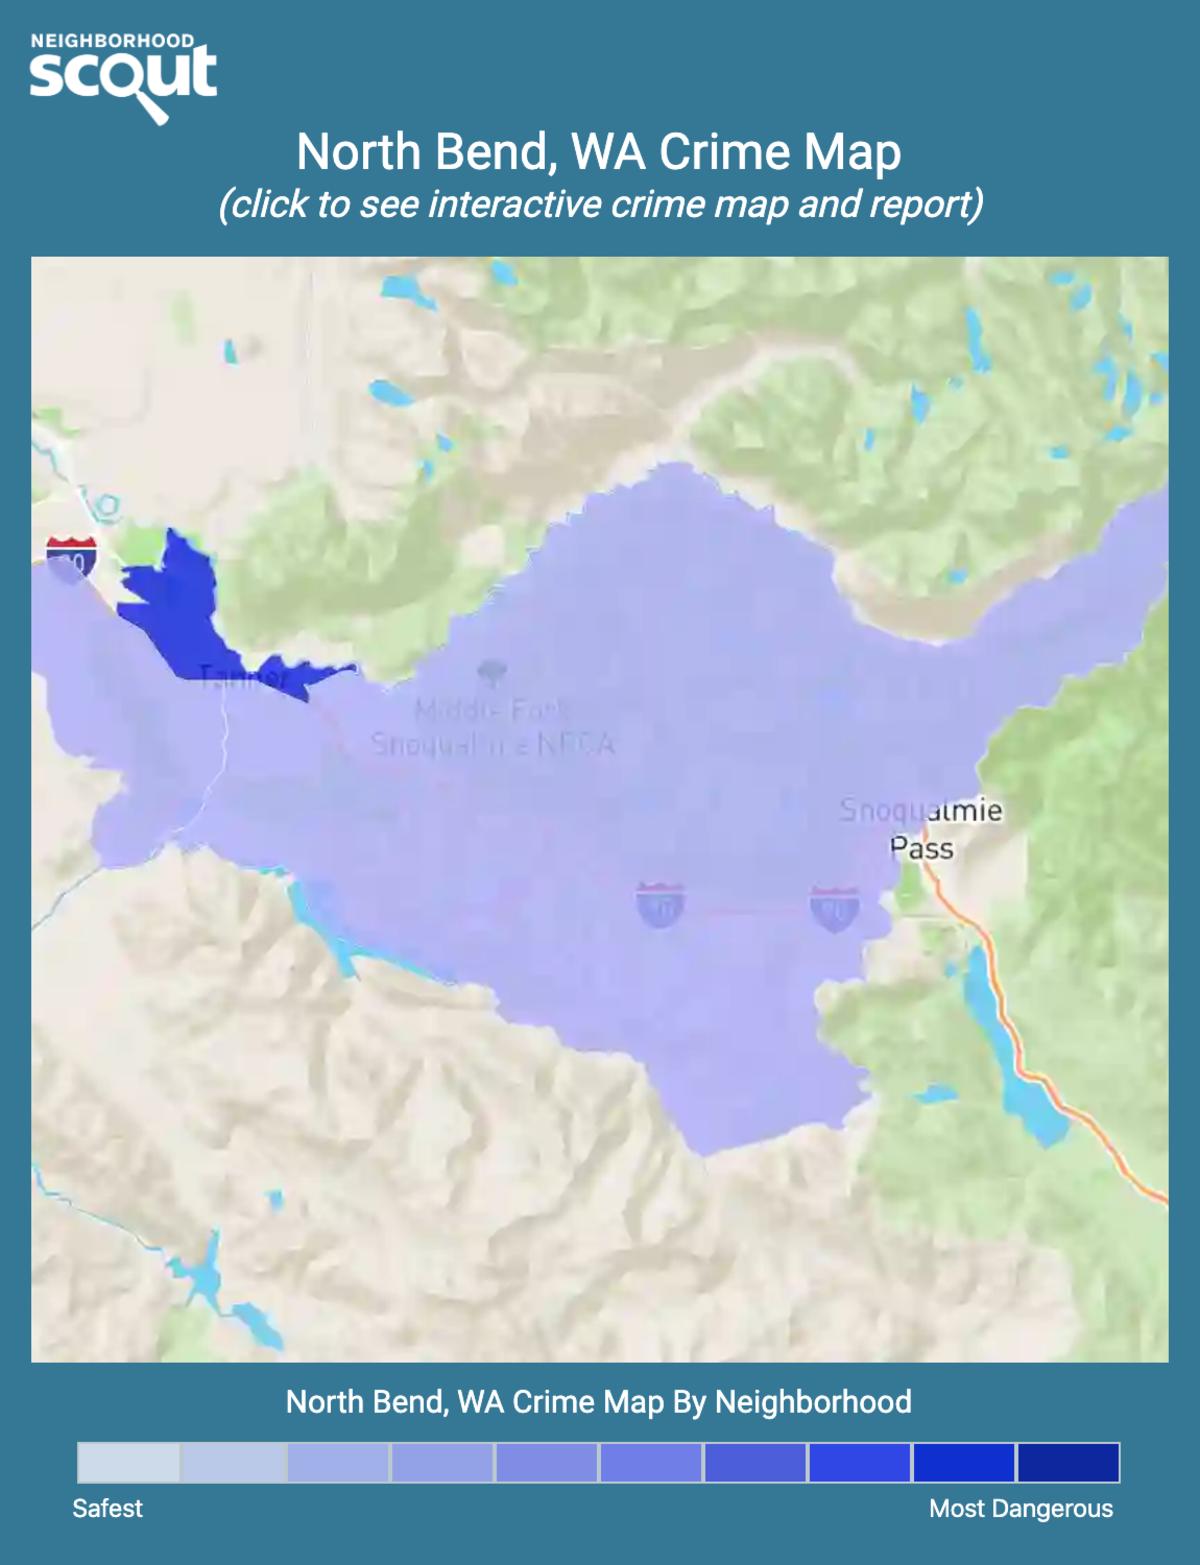 North Bend, Washington crime map